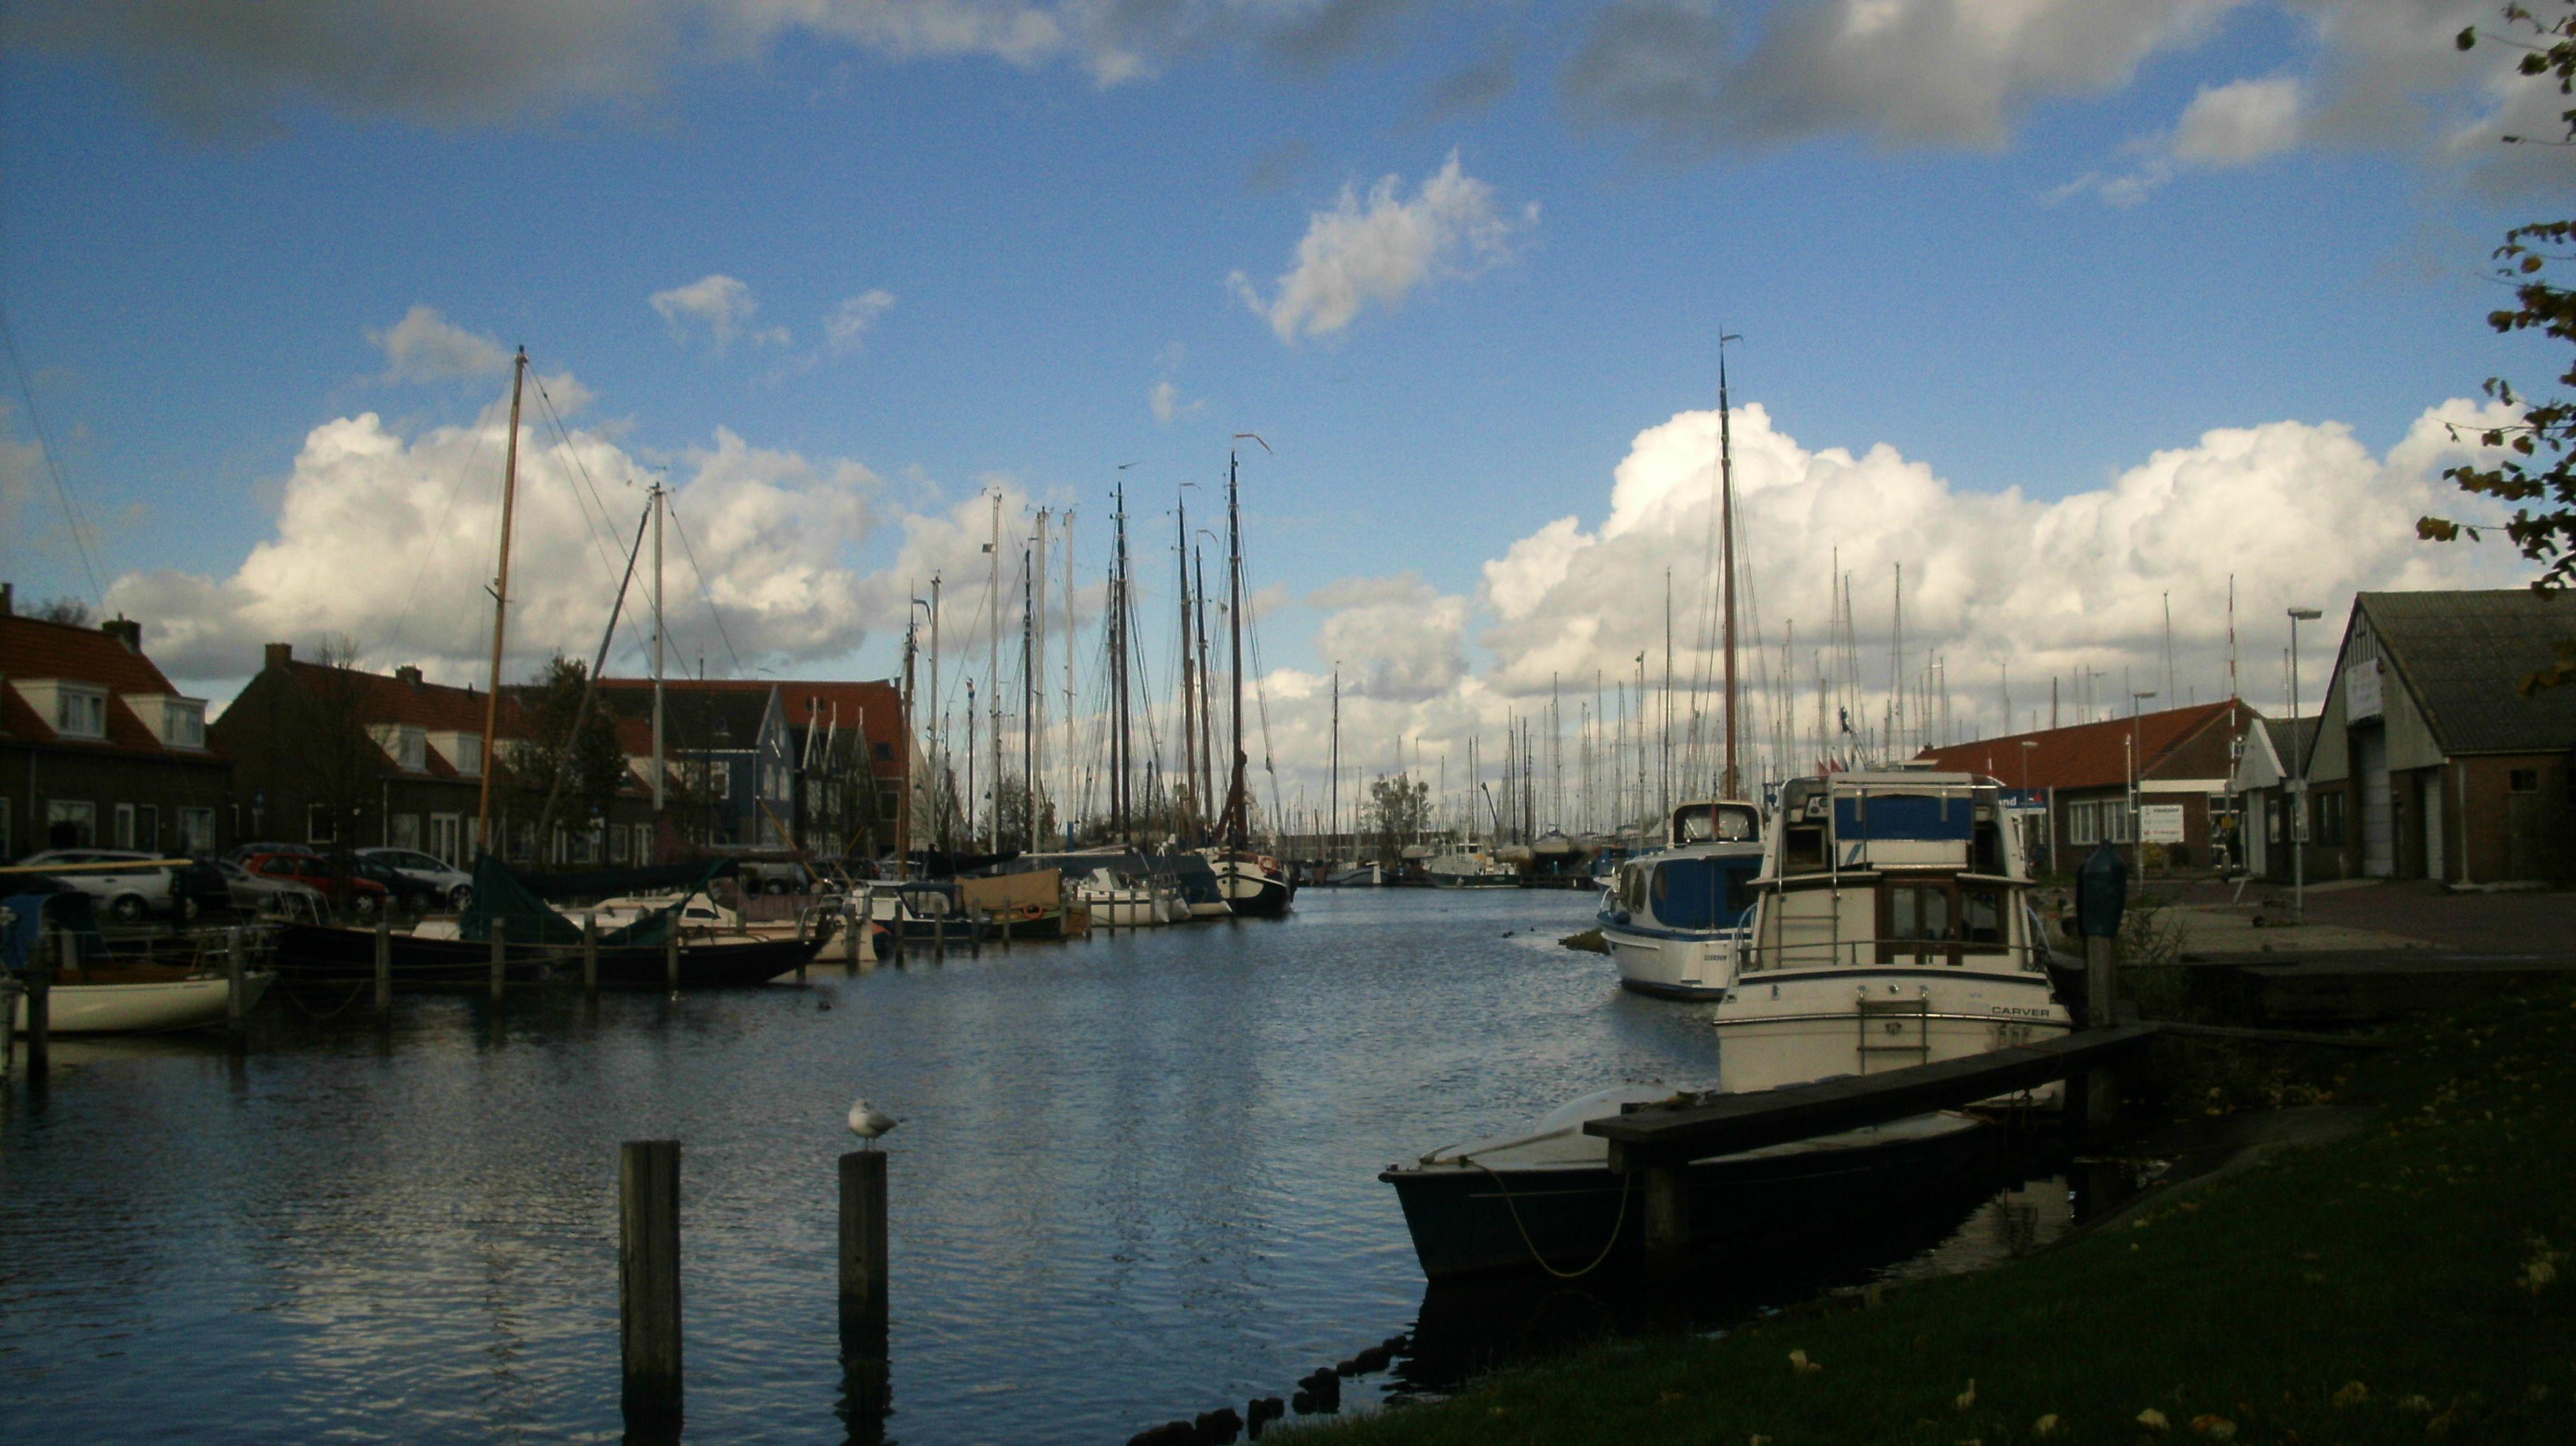 Monnickendam, The Netherlands